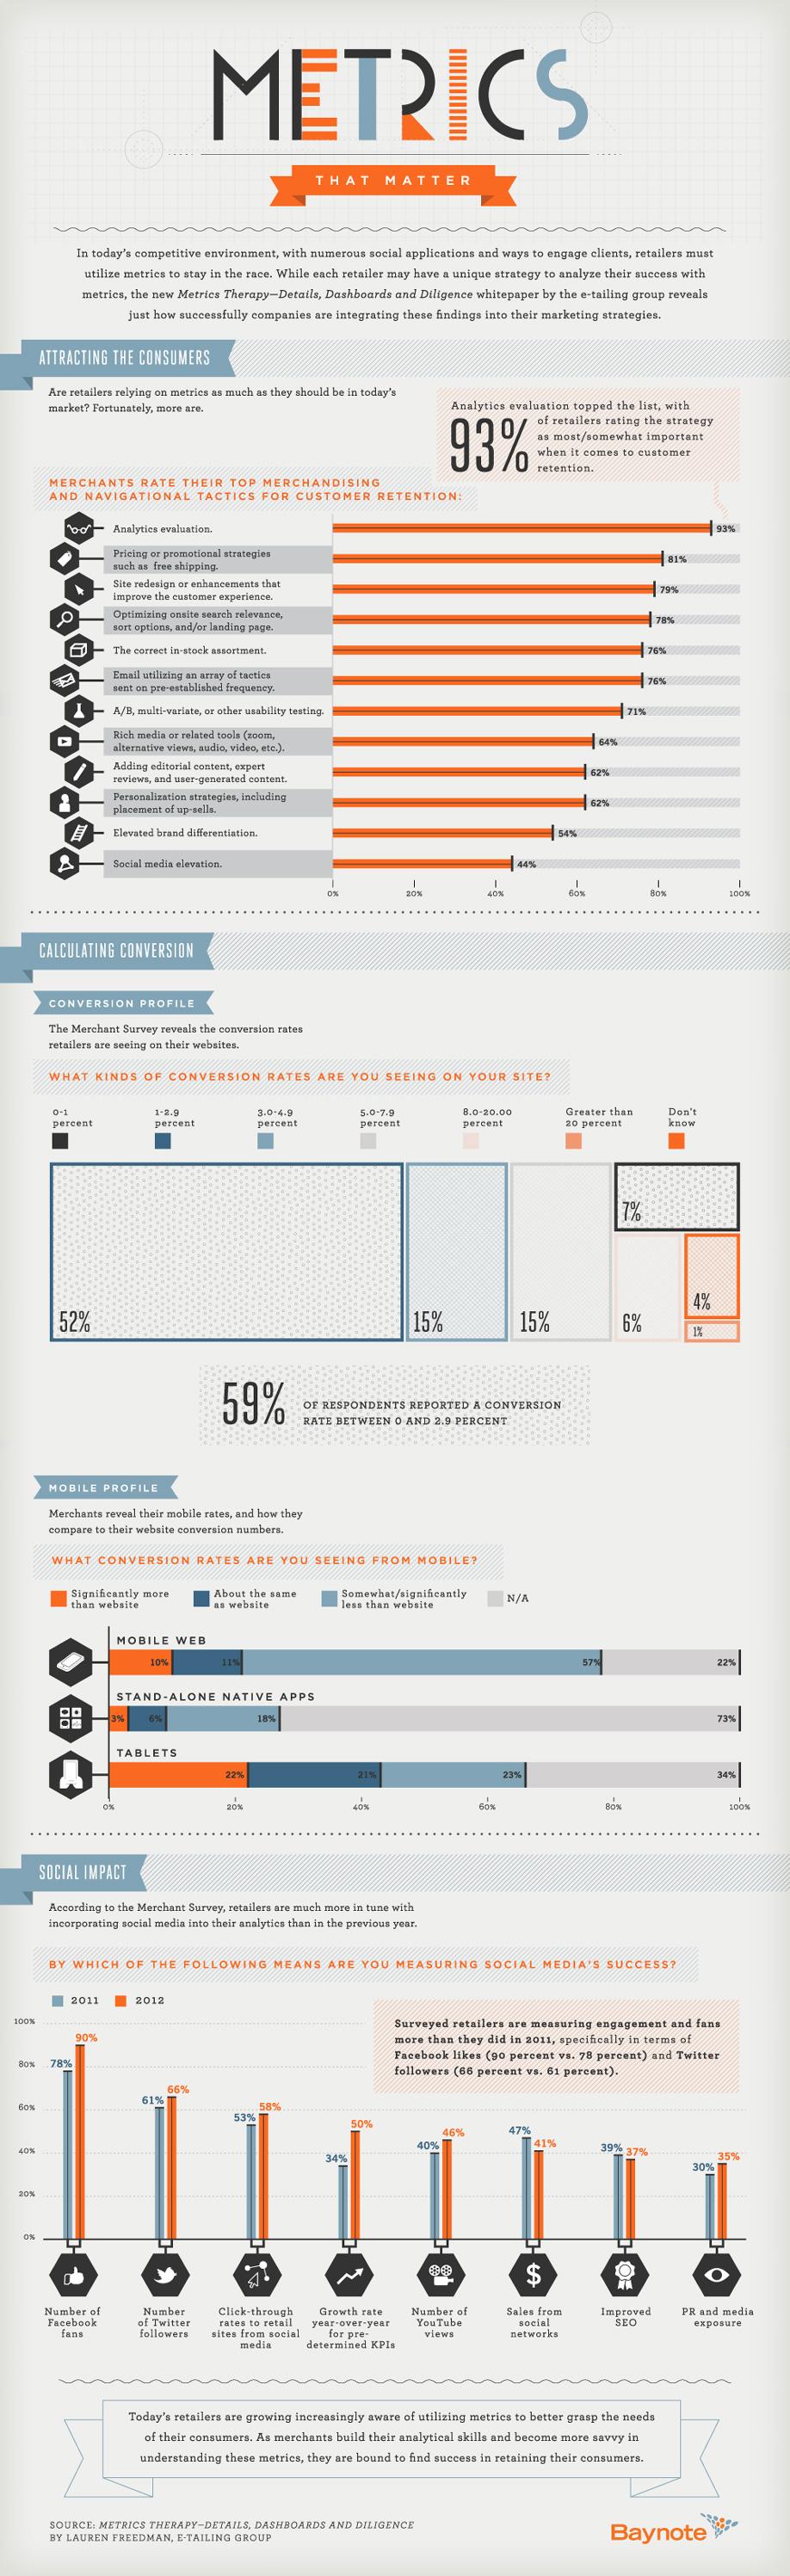 Infographic: Metrics that Matter